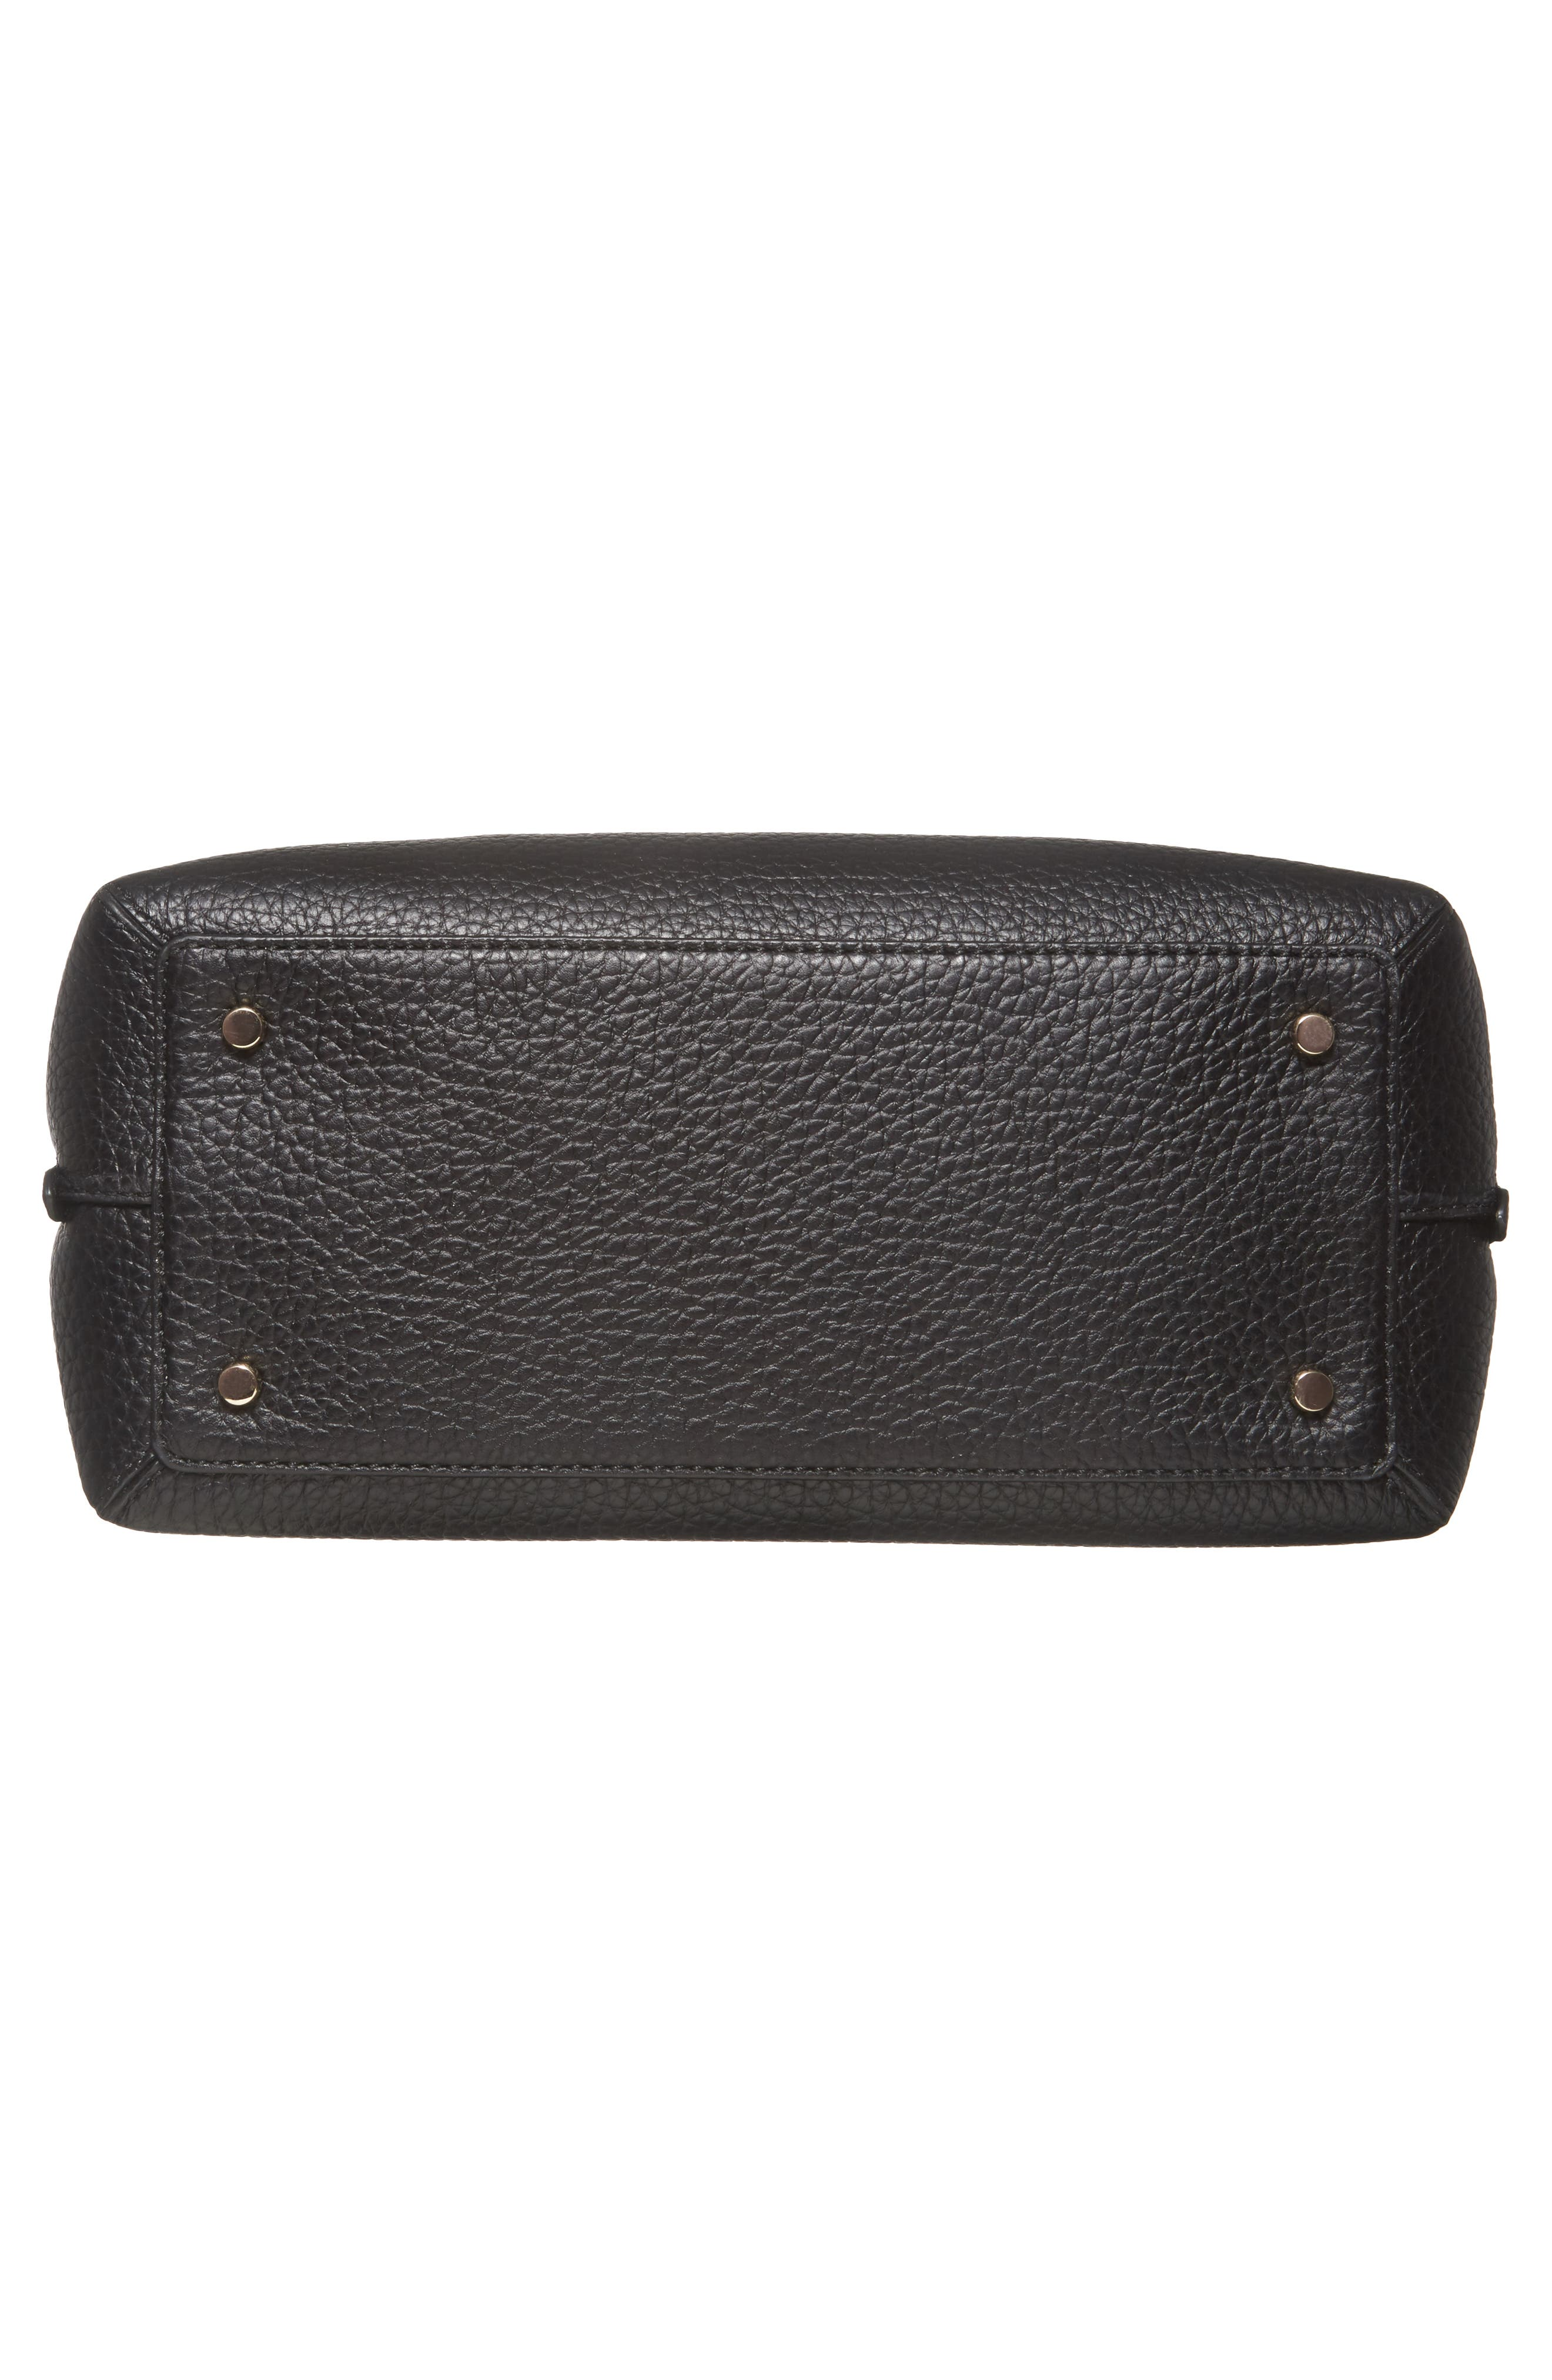 carter street - selena leather tote,                             Alternate thumbnail 6, color,                             Black